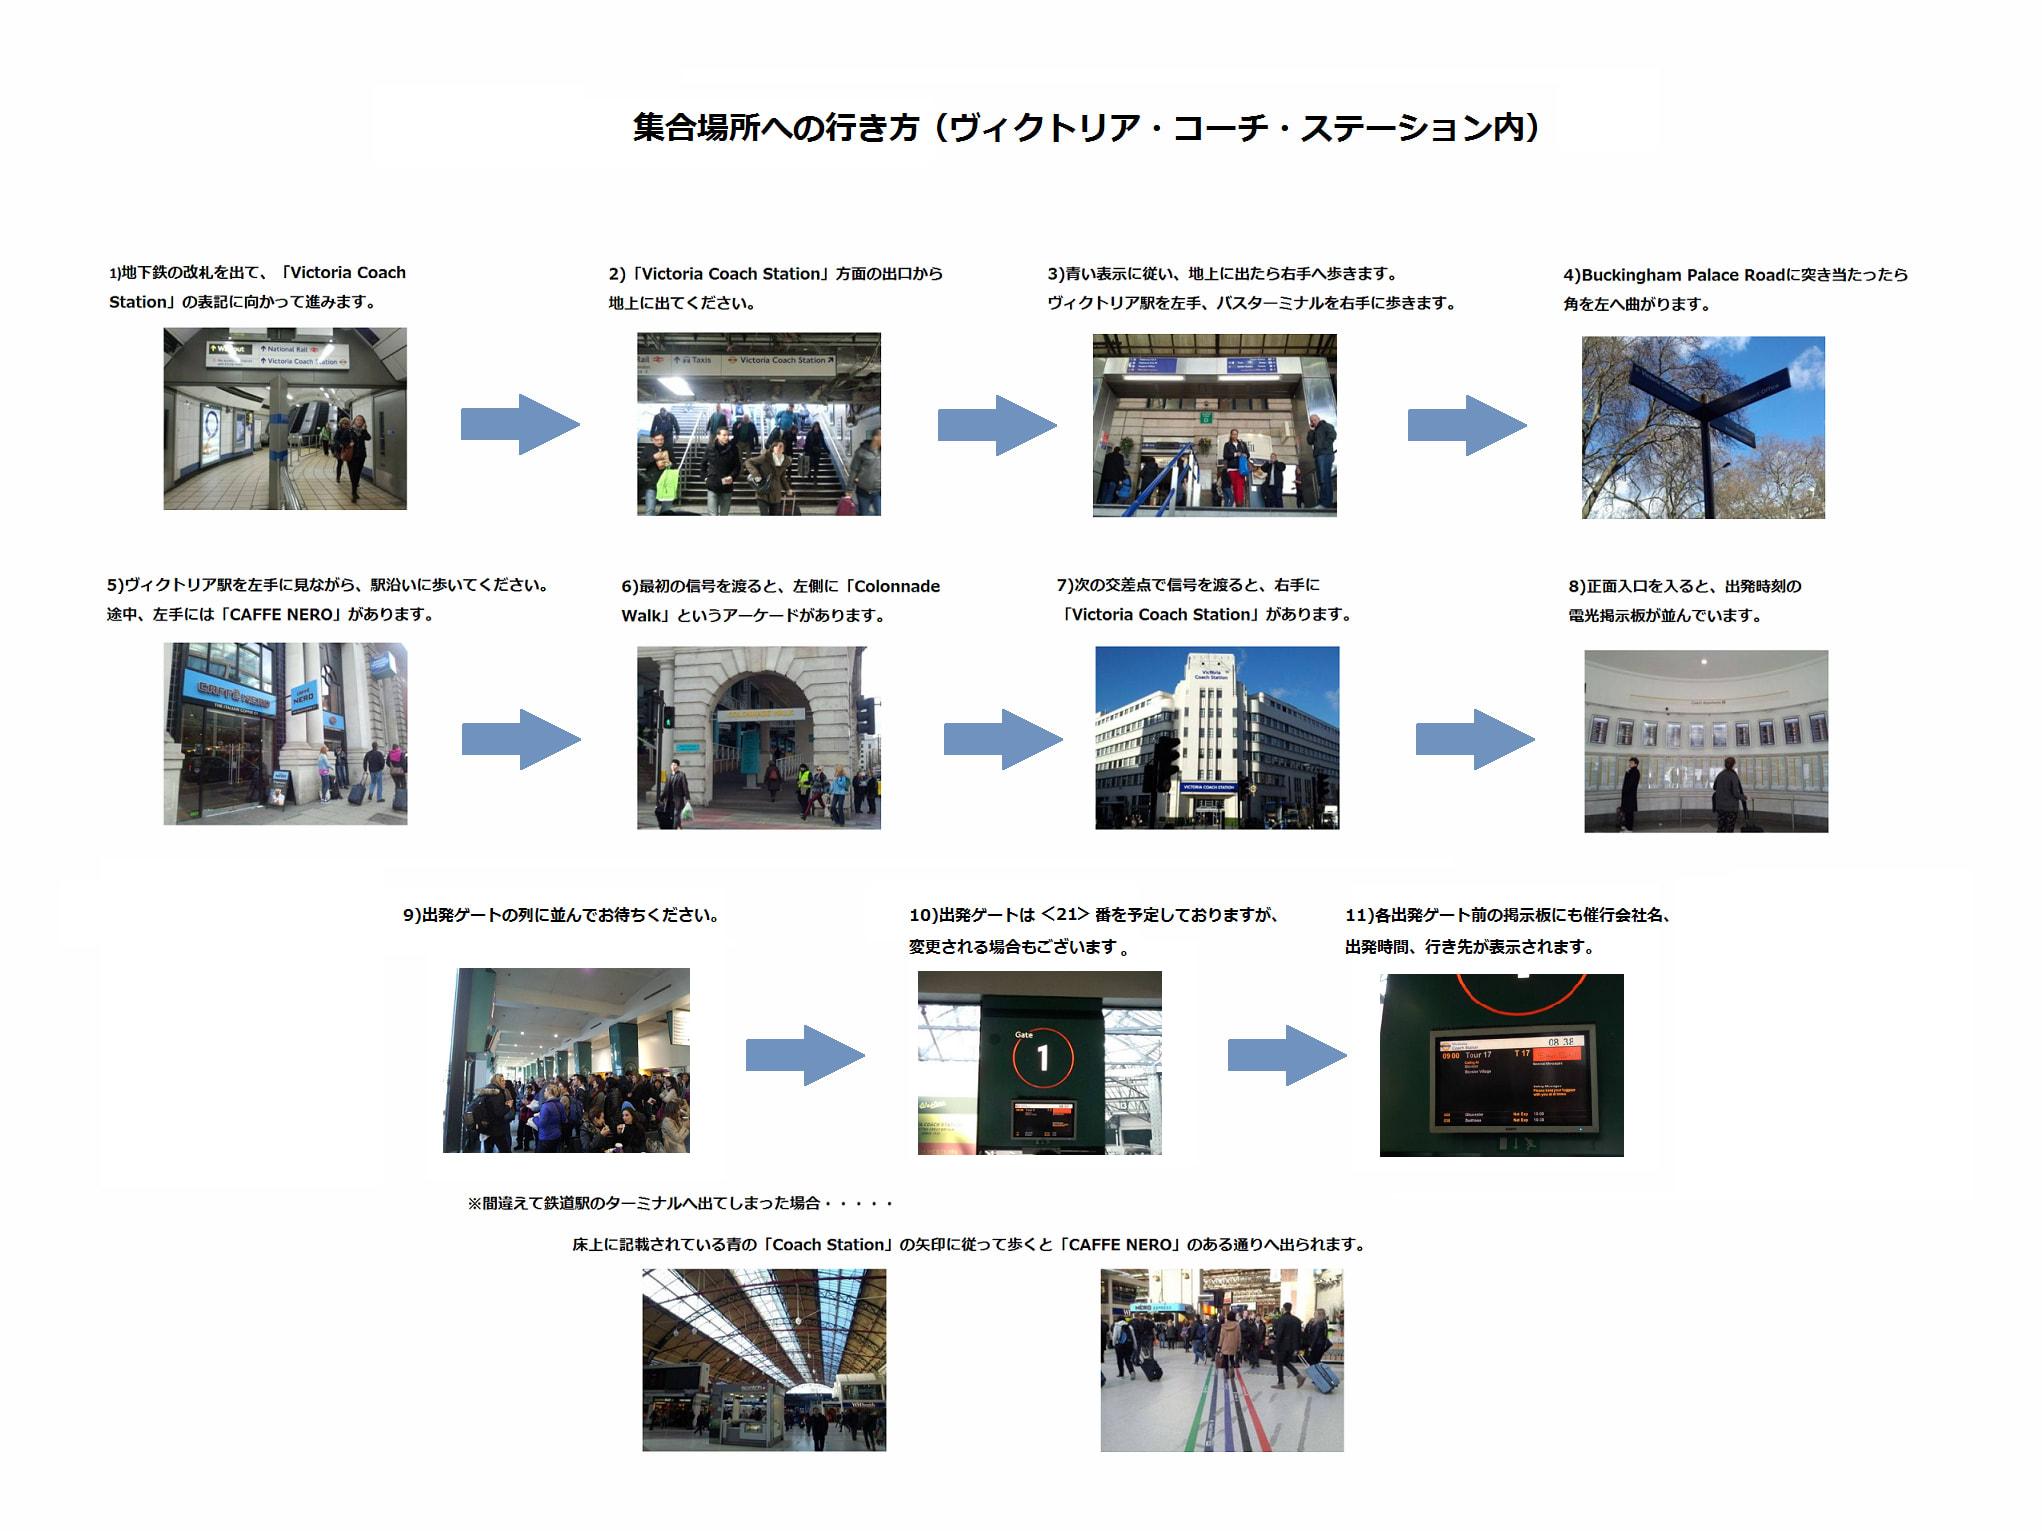 check-in-location(gate 21)